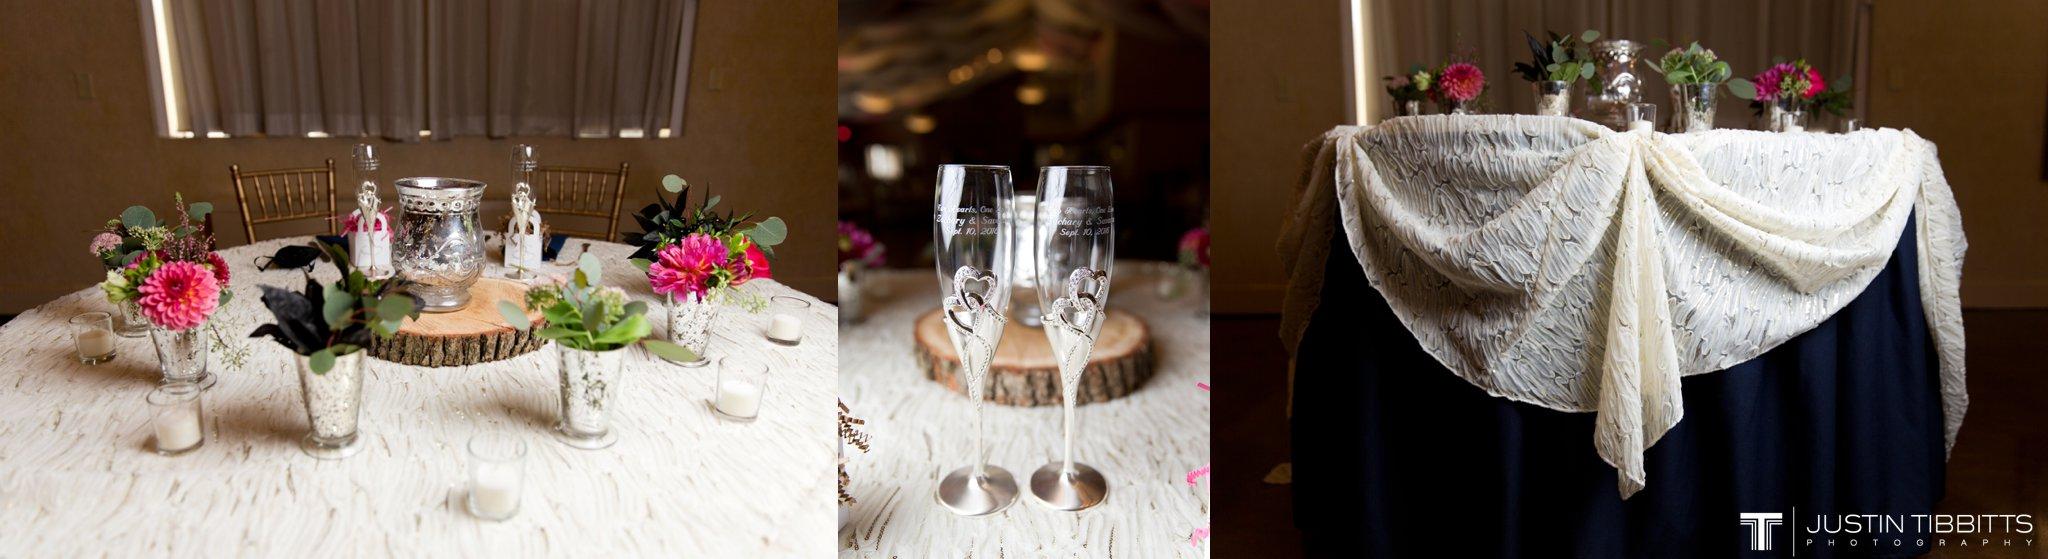 Birch Hill Wedding Photos with Savanna and Zachary_0086